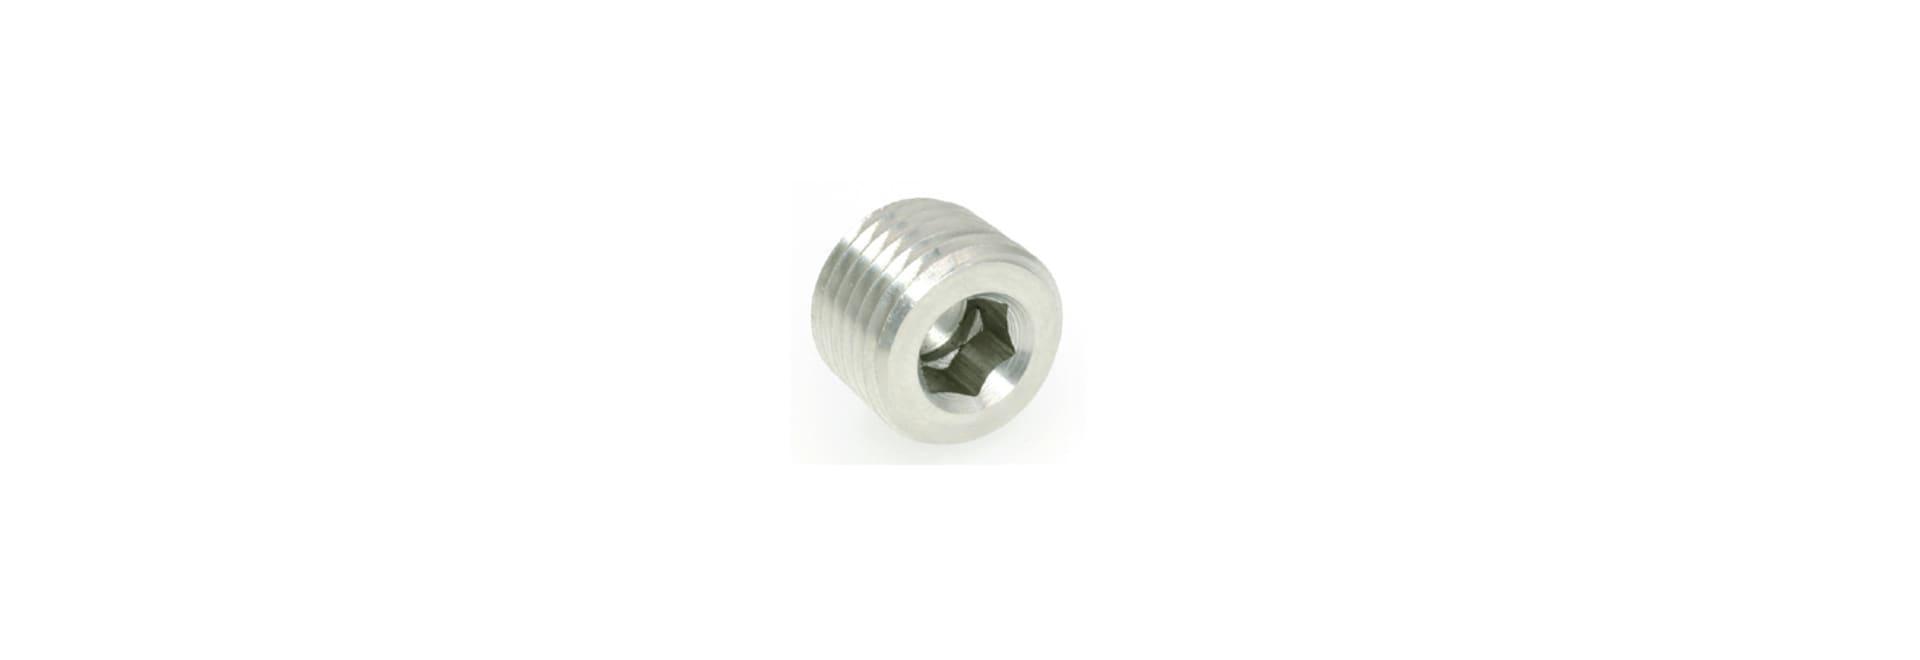 Brass Pipe Fitting Inner Hexagon Plug